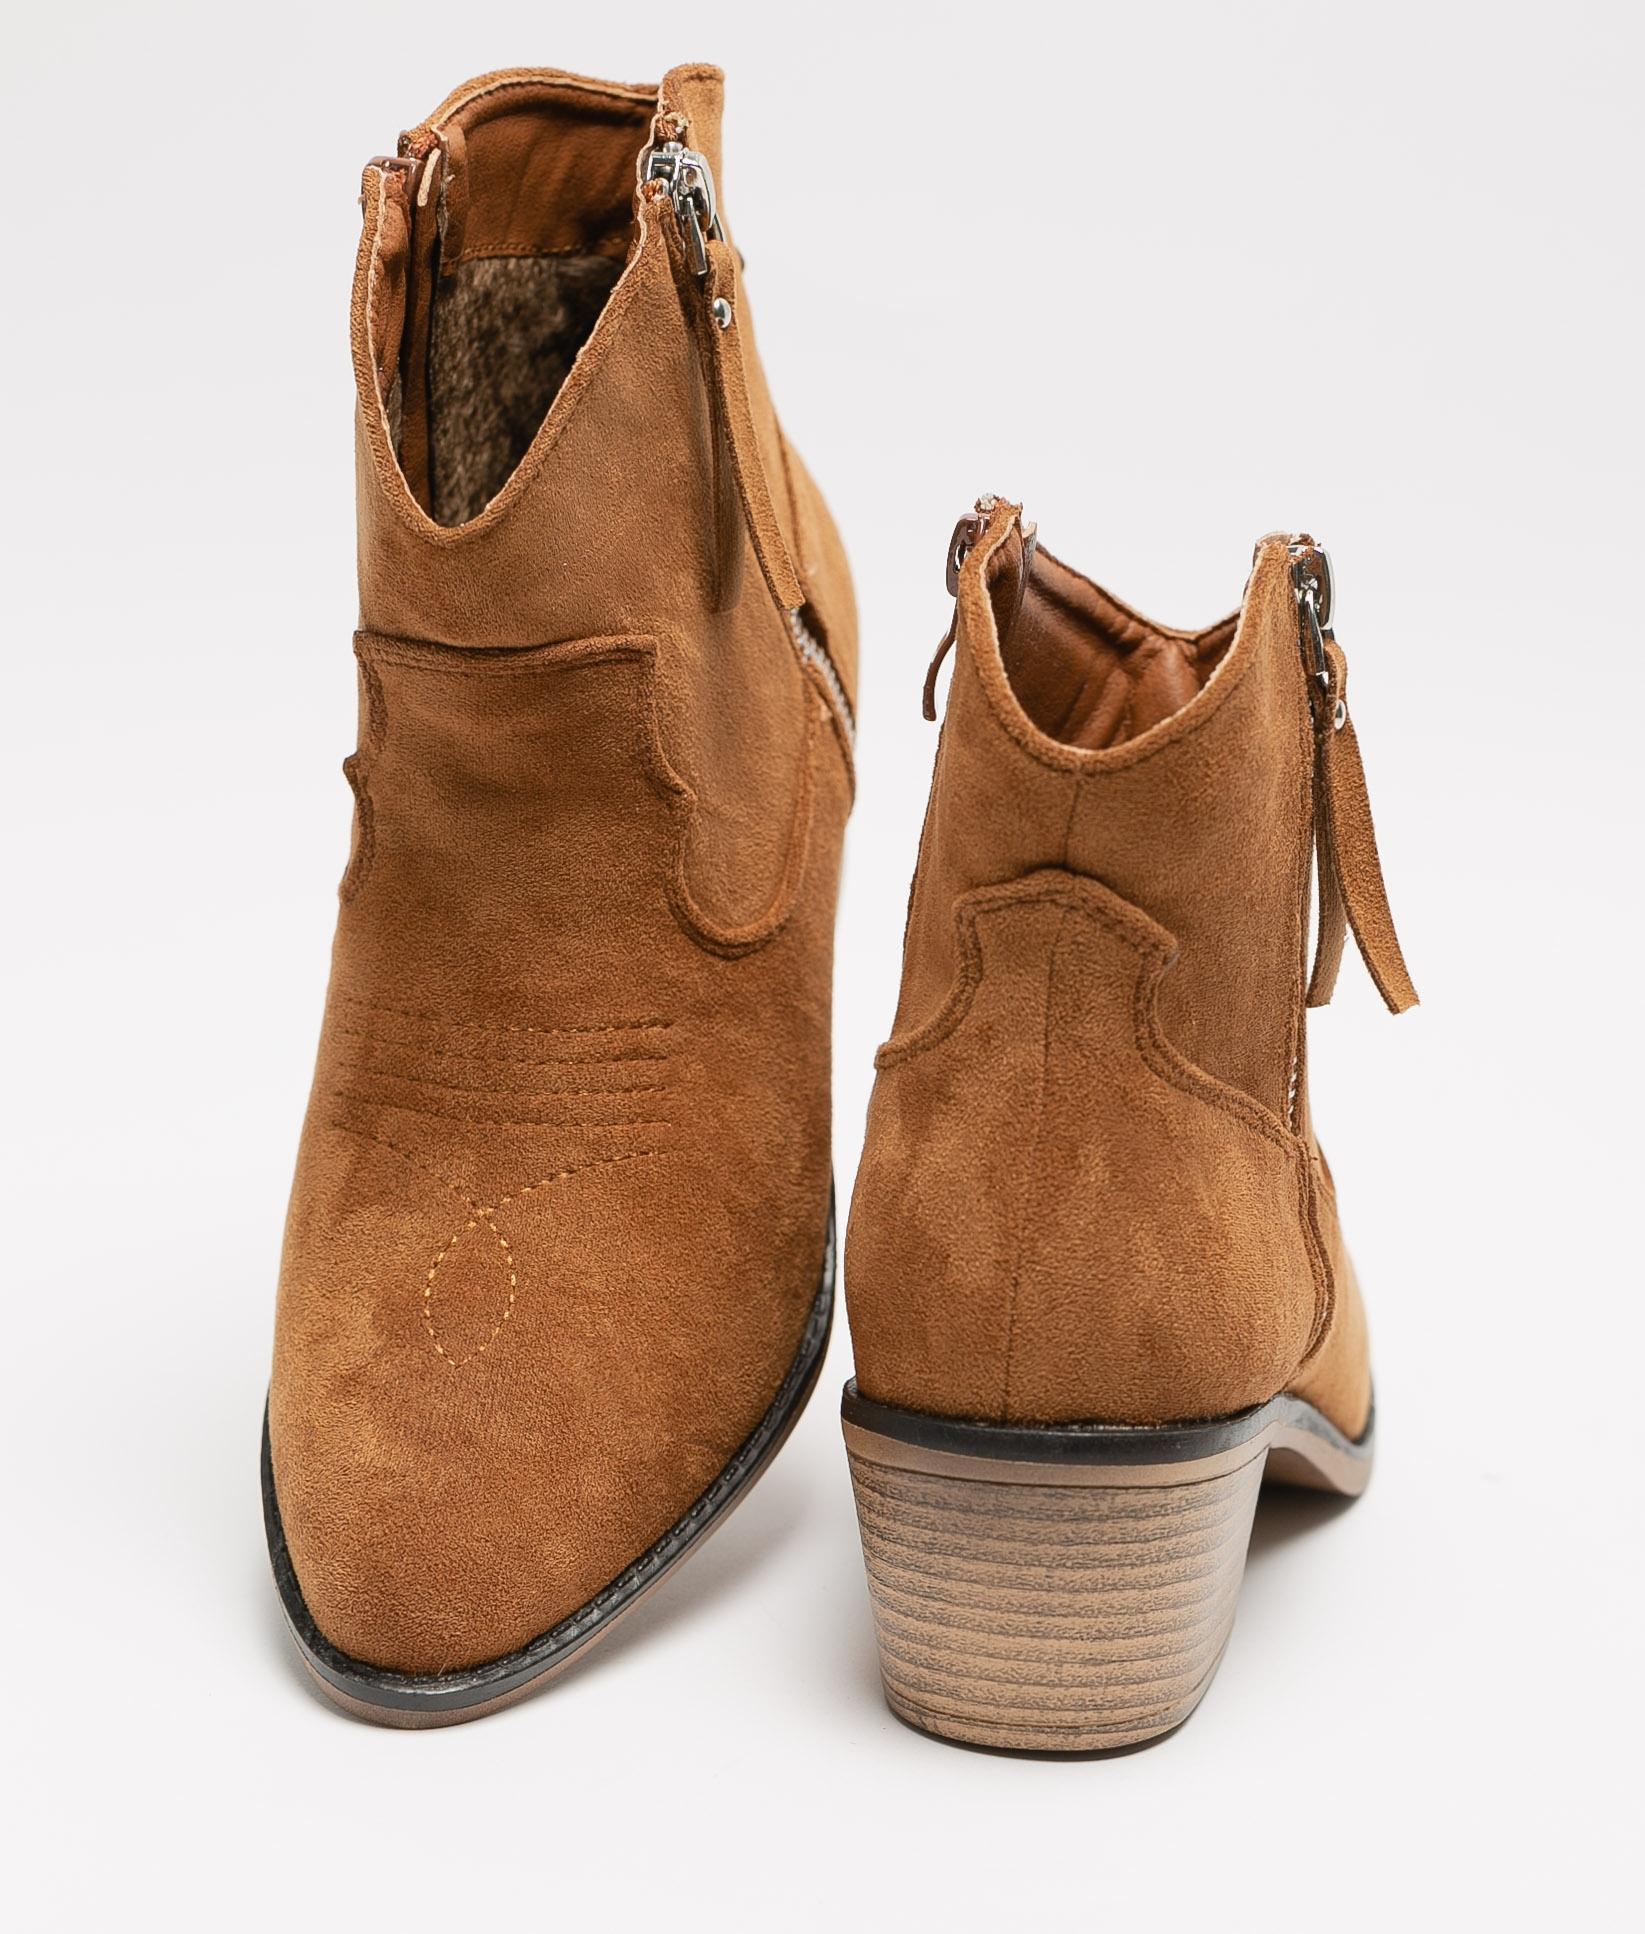 Boot Petite Sule - Chameau